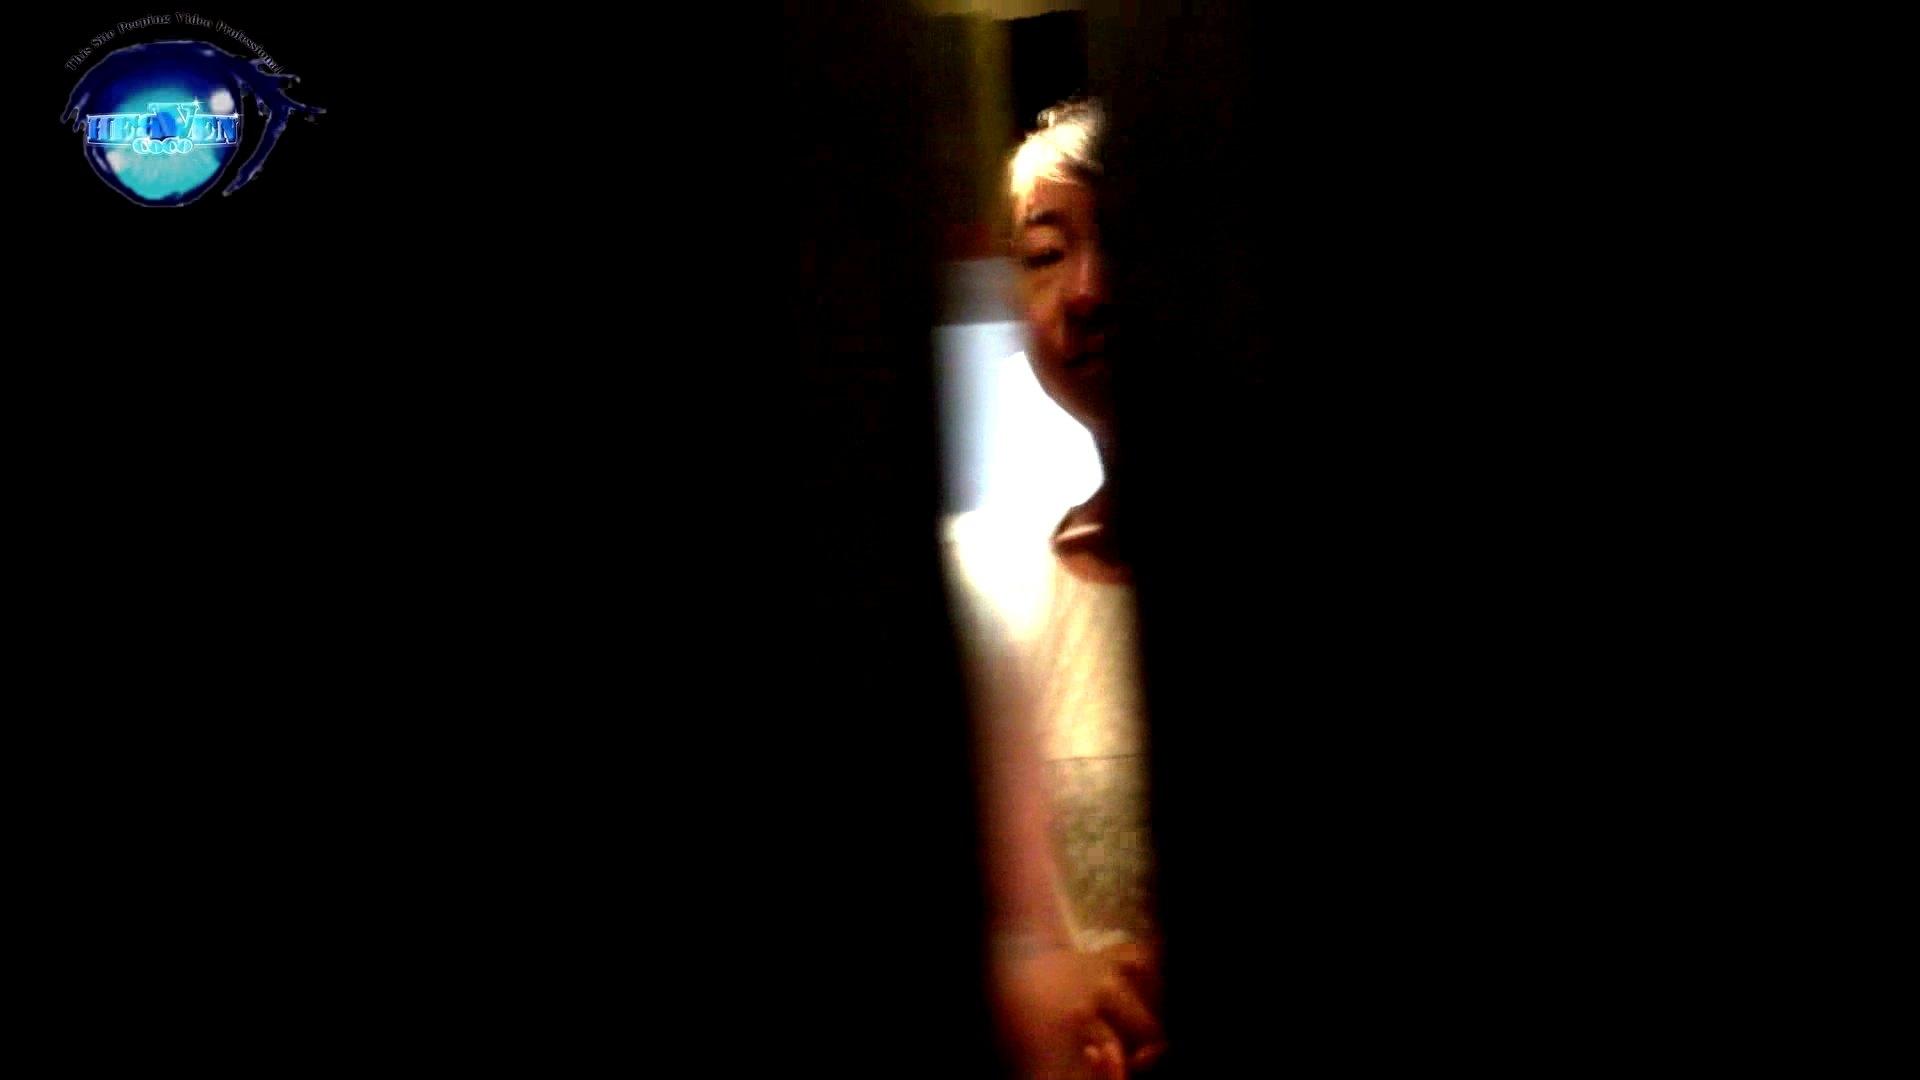 GOD HAND ファッションショッピングセンター盗撮vol.06 高画質 ワレメ動画紹介 51連発 32